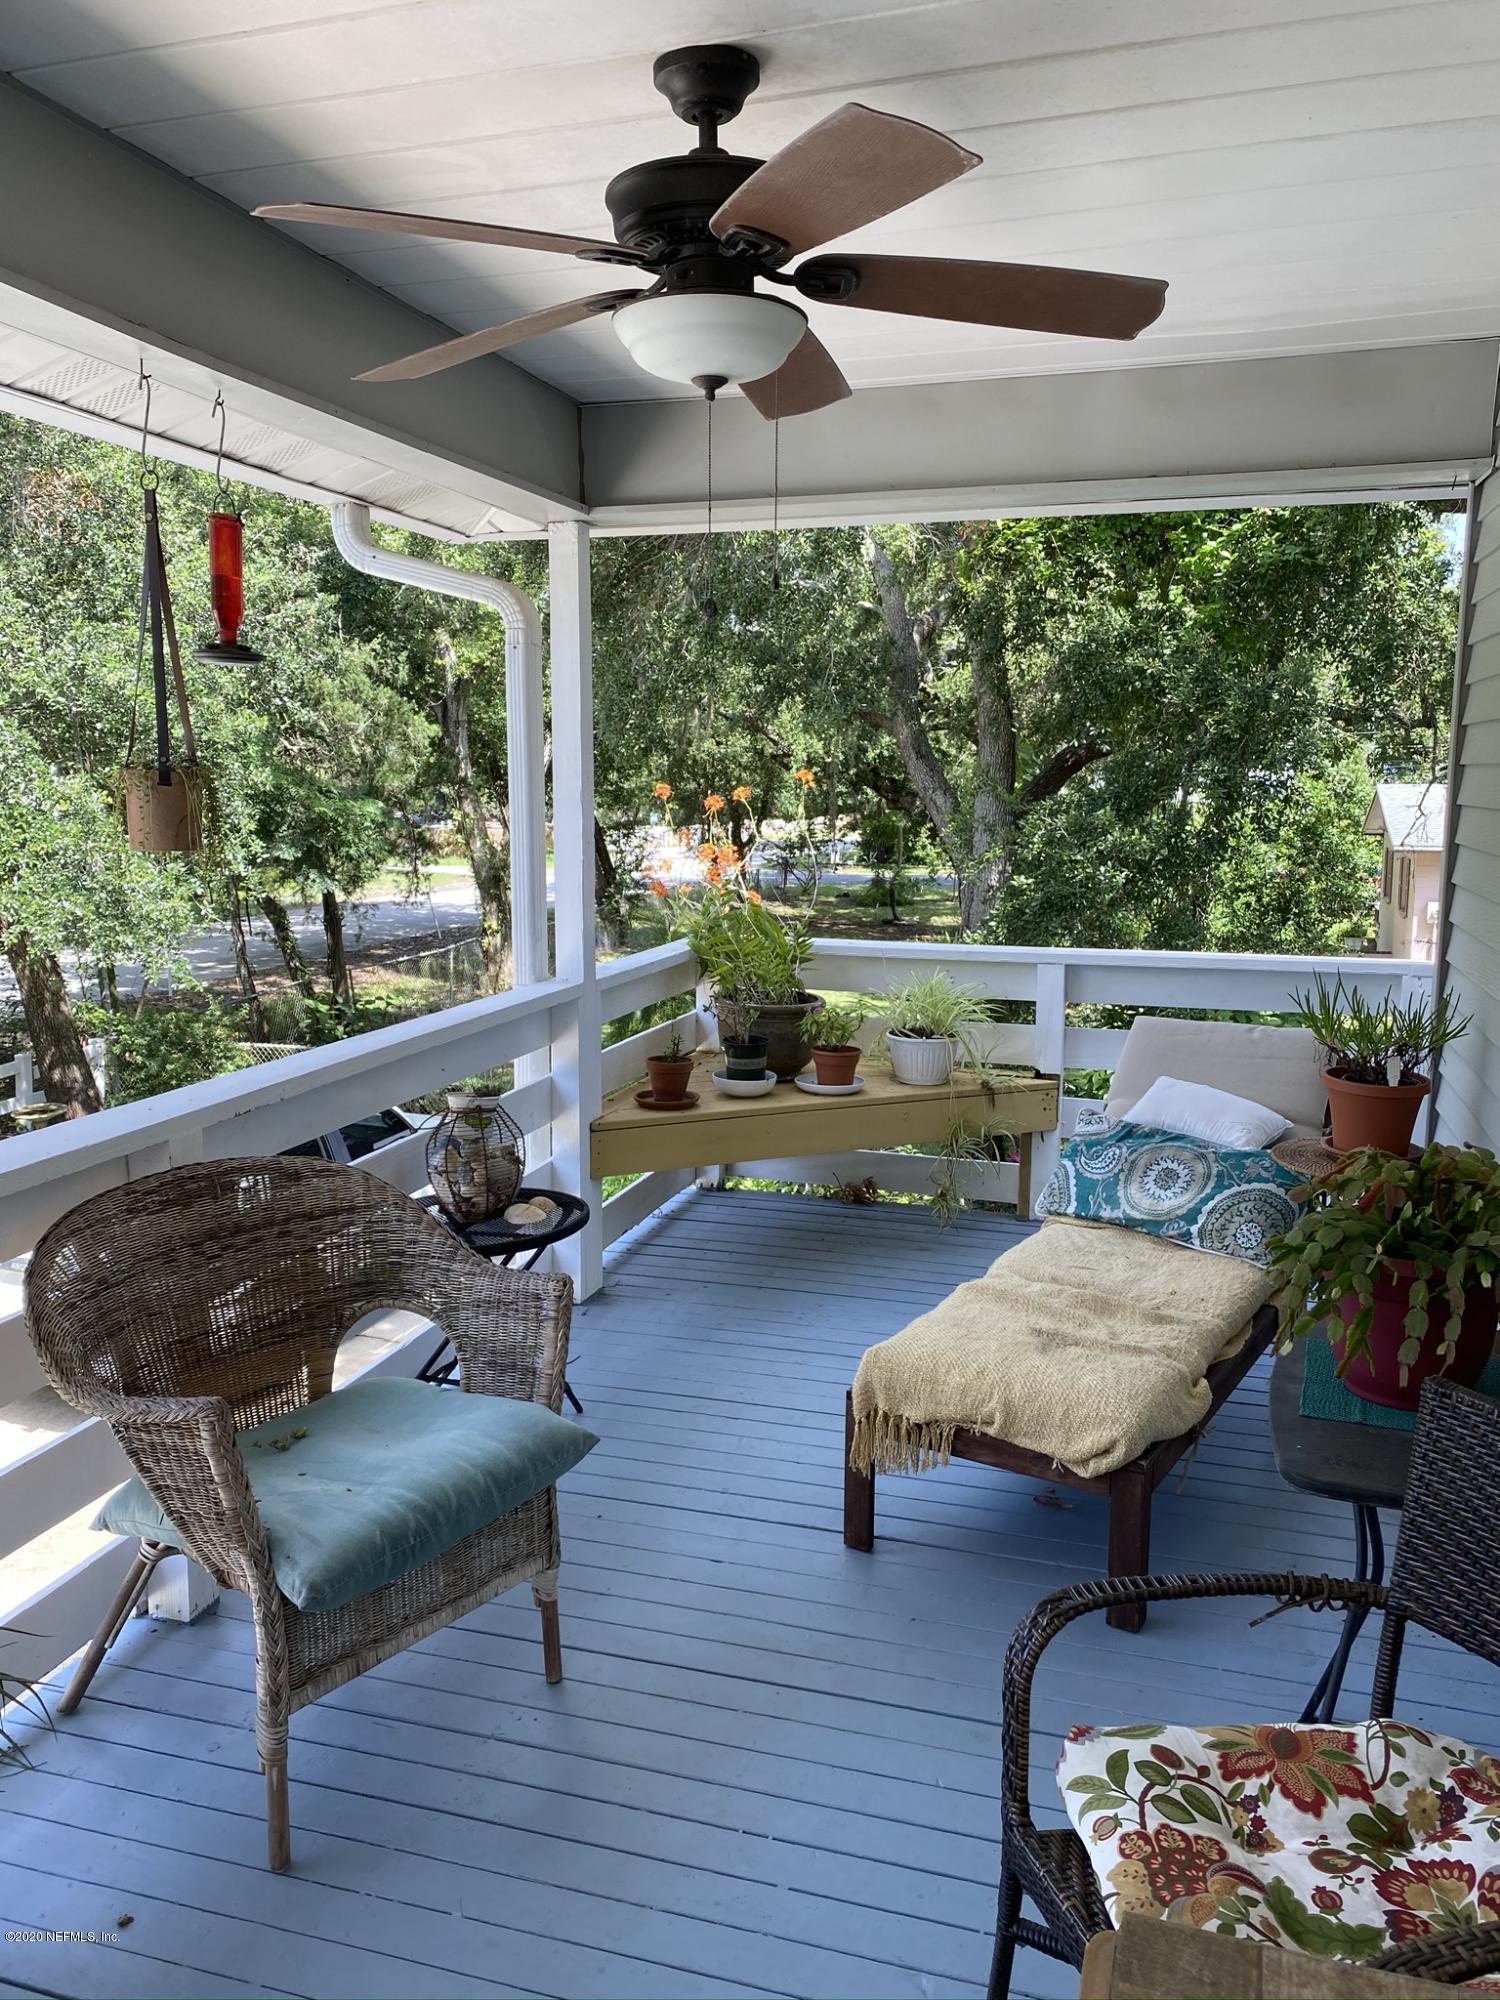 4300 MYRTLE, ST AUGUSTINE, FLORIDA 32084, 3 Bedrooms Bedrooms, ,1 BathroomBathrooms,Residential,For sale,MYRTLE,1066026